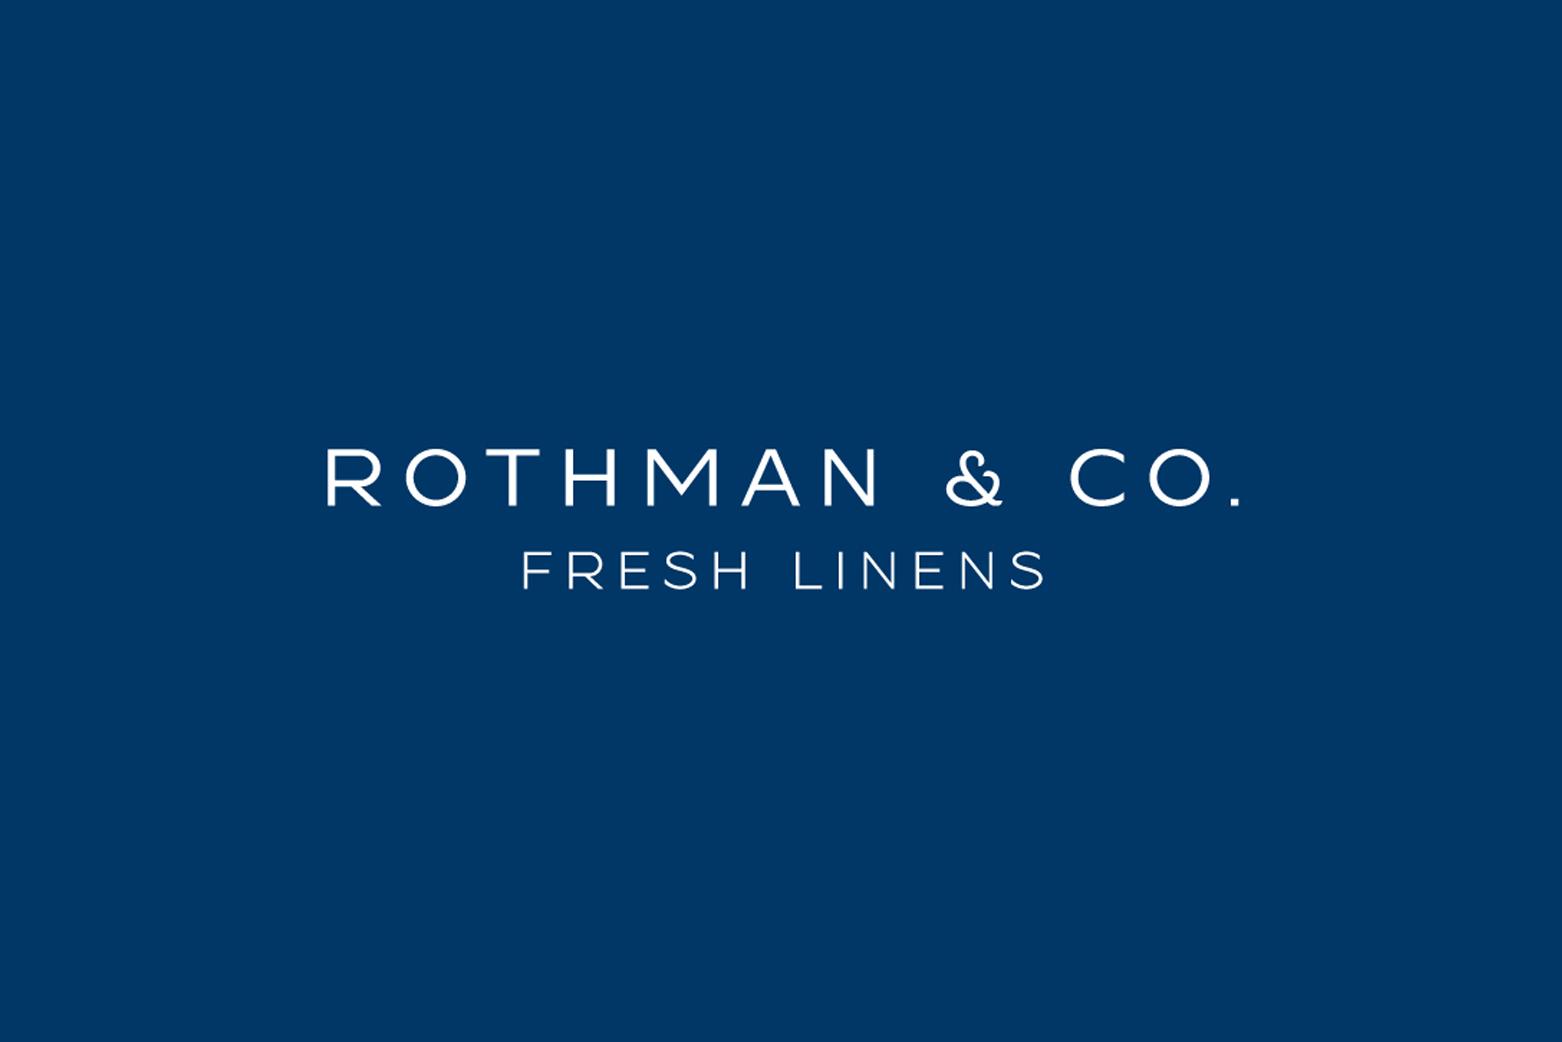 Rothman & Co.